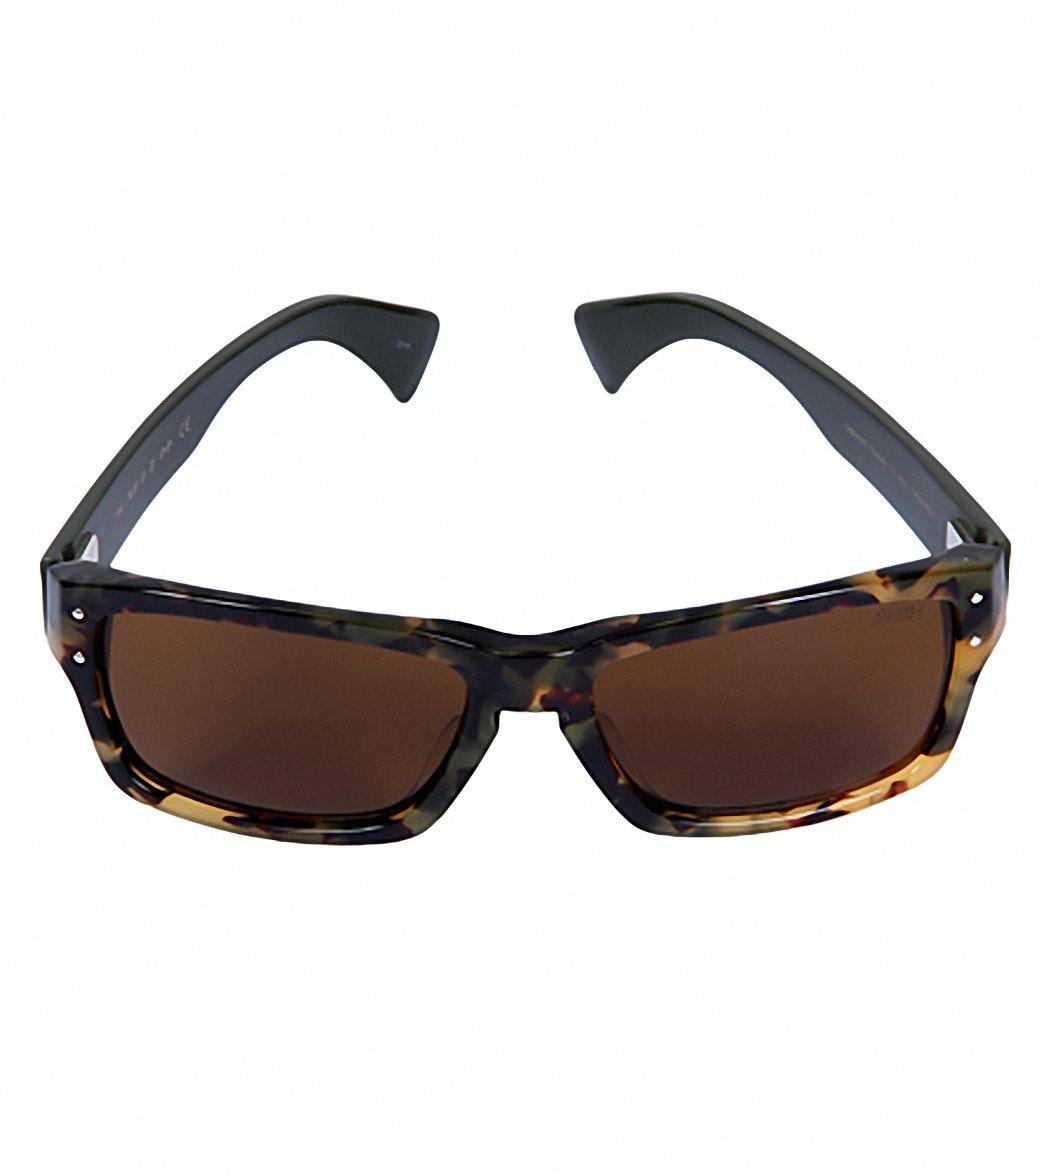 4f96adb302e1b Smith Chemist Polarized Sunglasses at SwimOutlet.com - Free Shipping